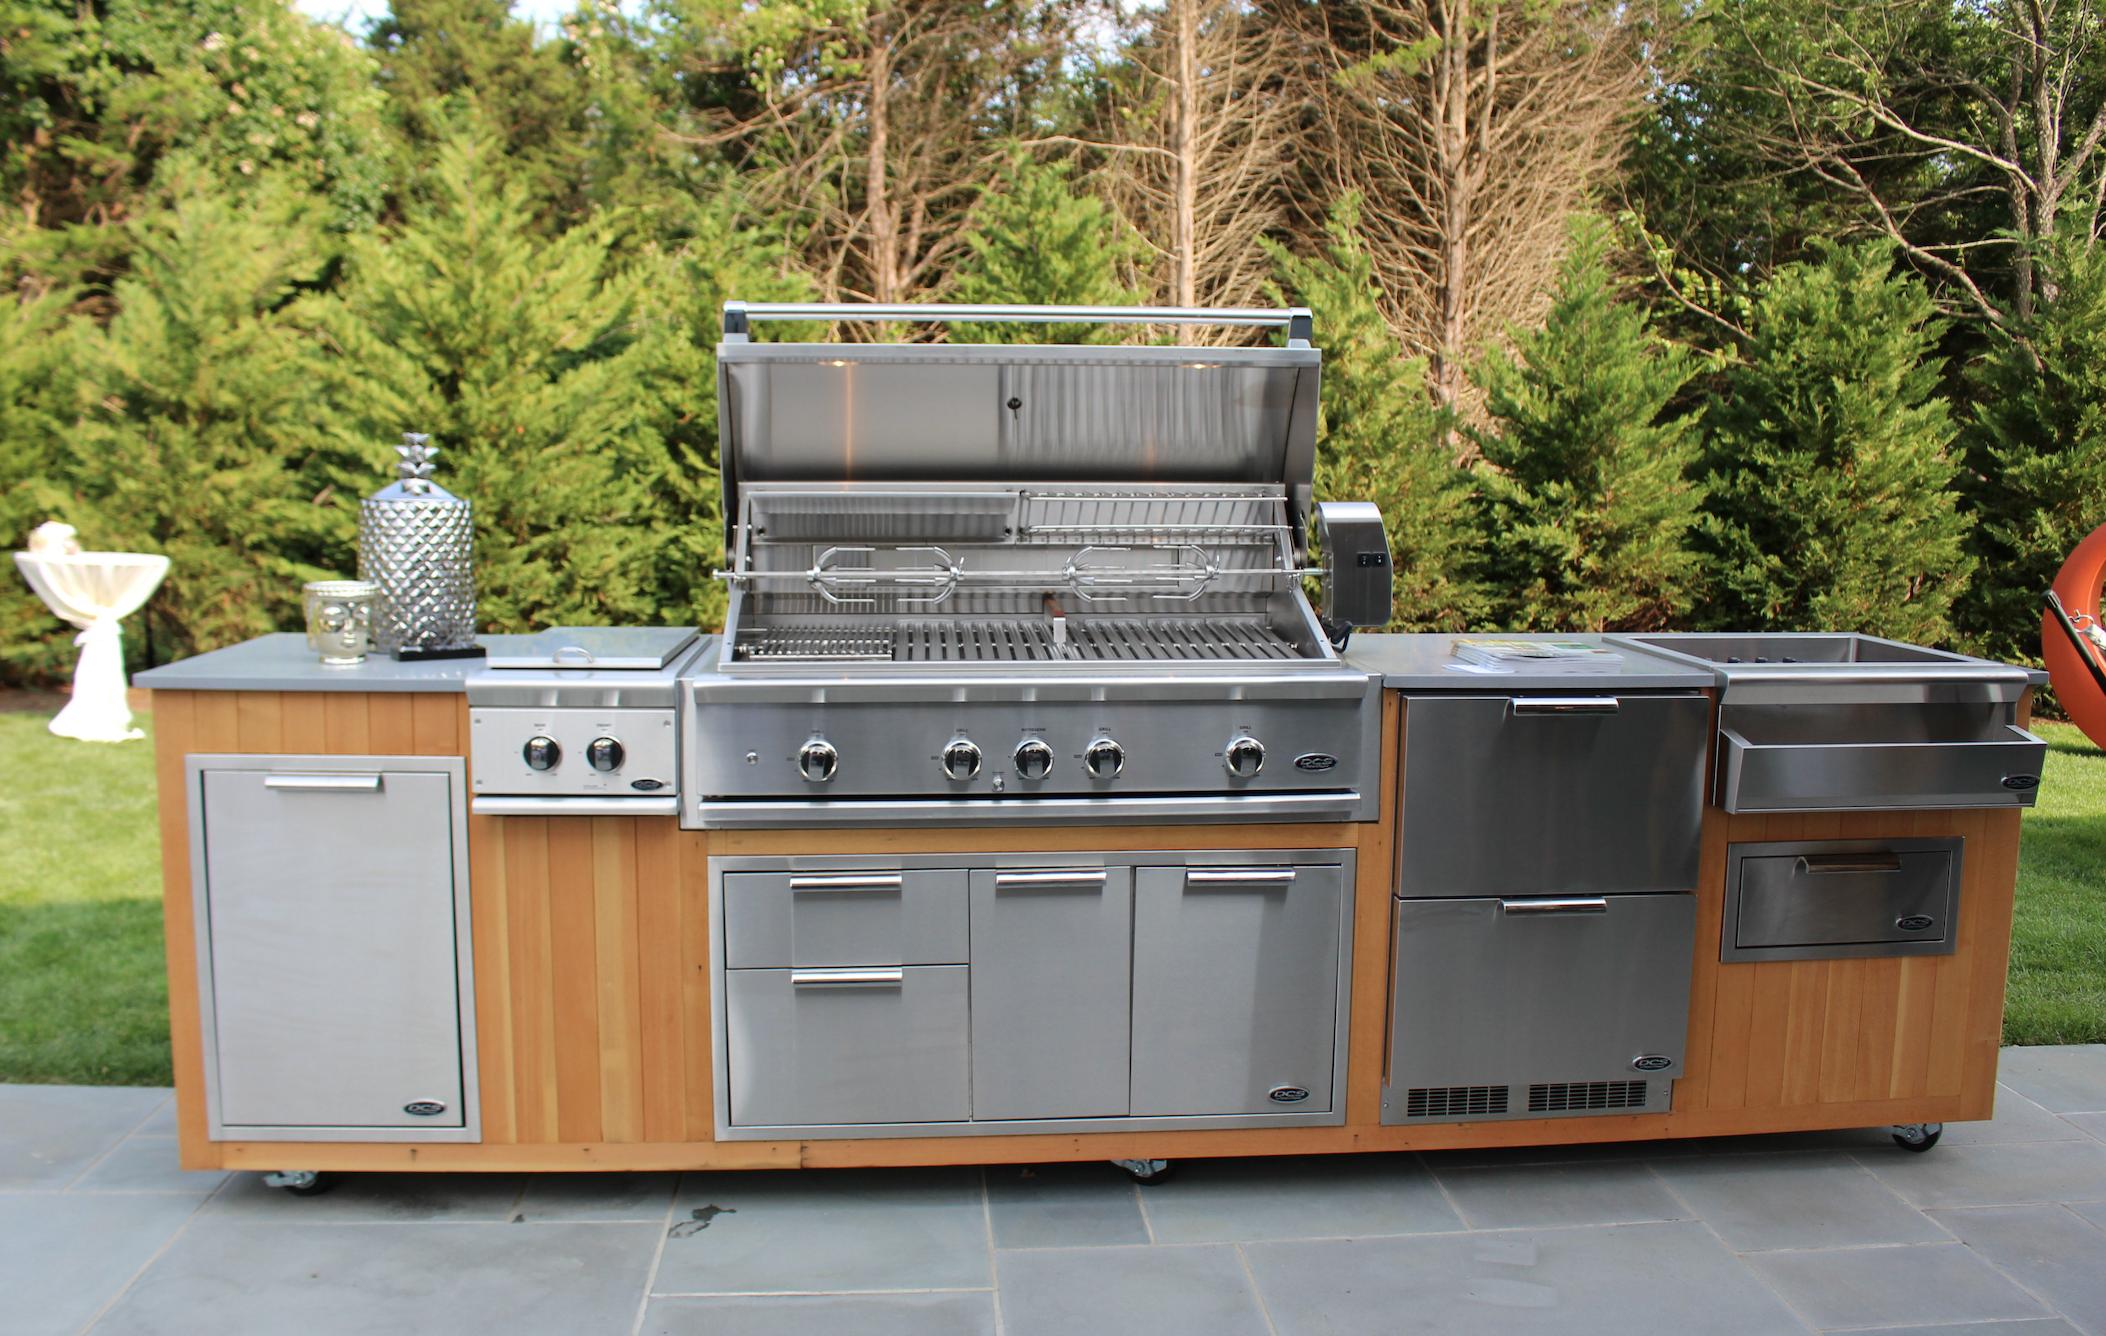 Dcs Dcshamptng Outdoor Kitchen Built In Grill Outdoor Appliances